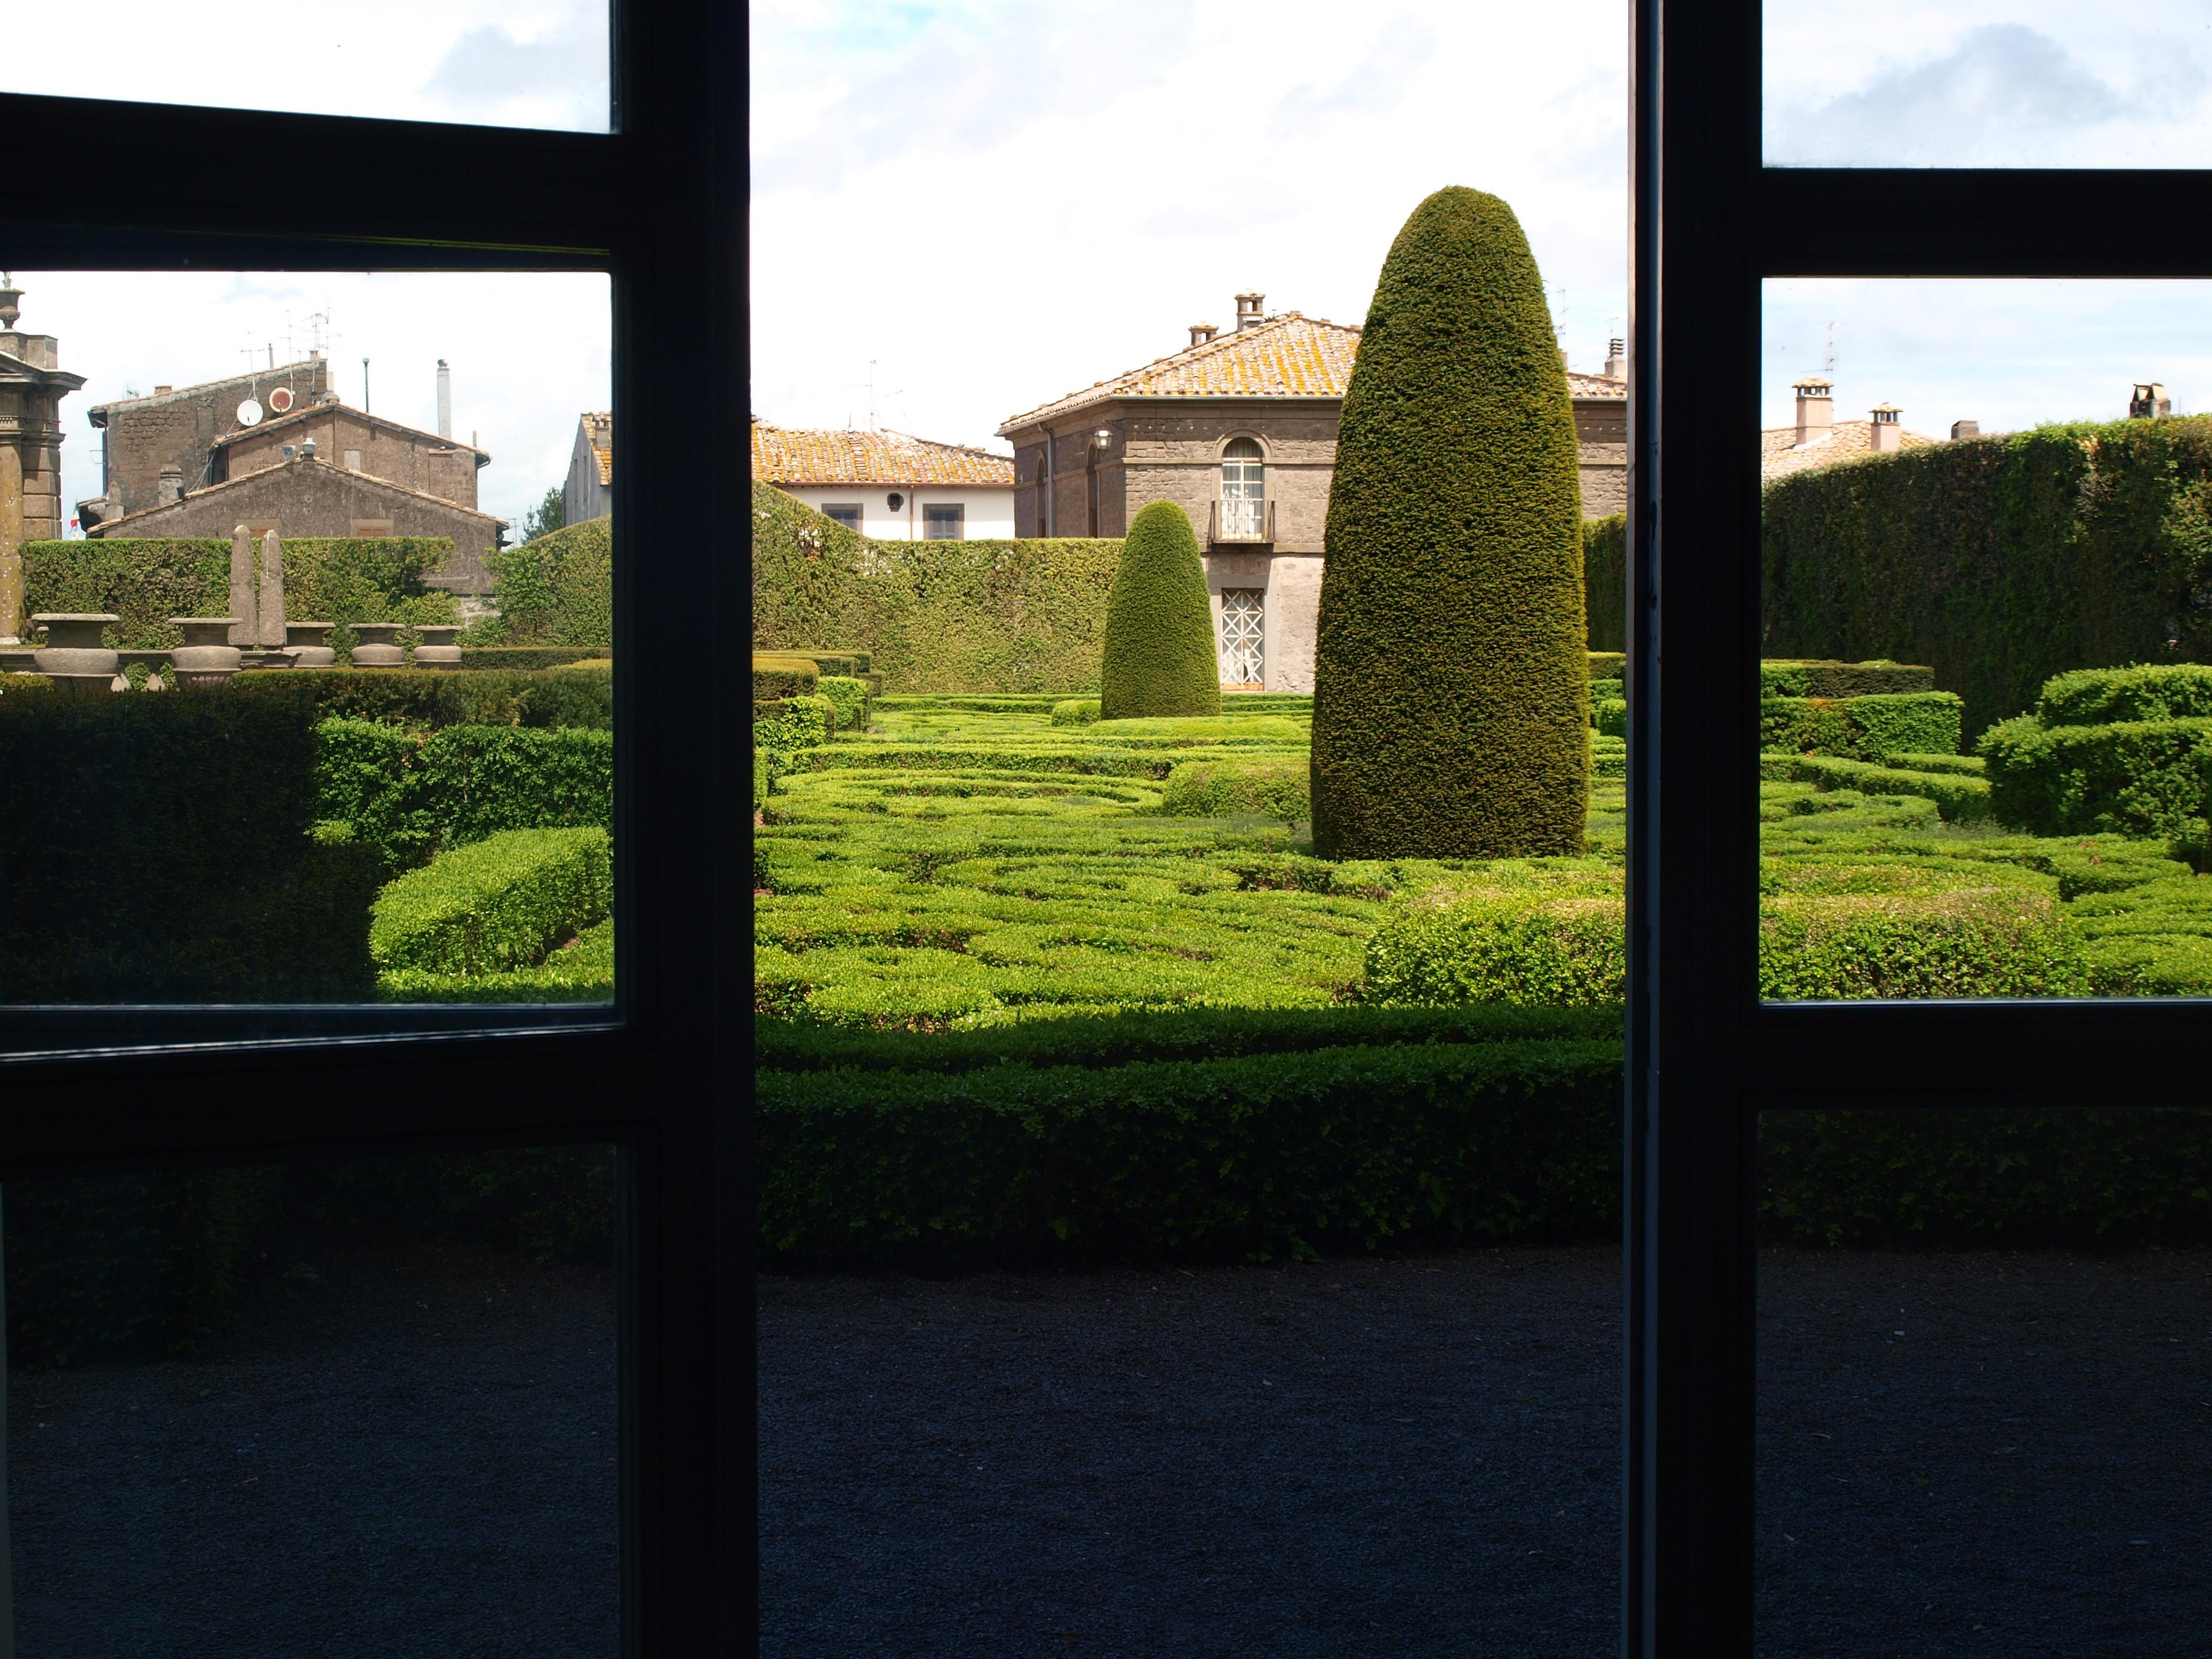 Villa Lante  a Bagnaia, Viterbo. Un giardino storico da visitare